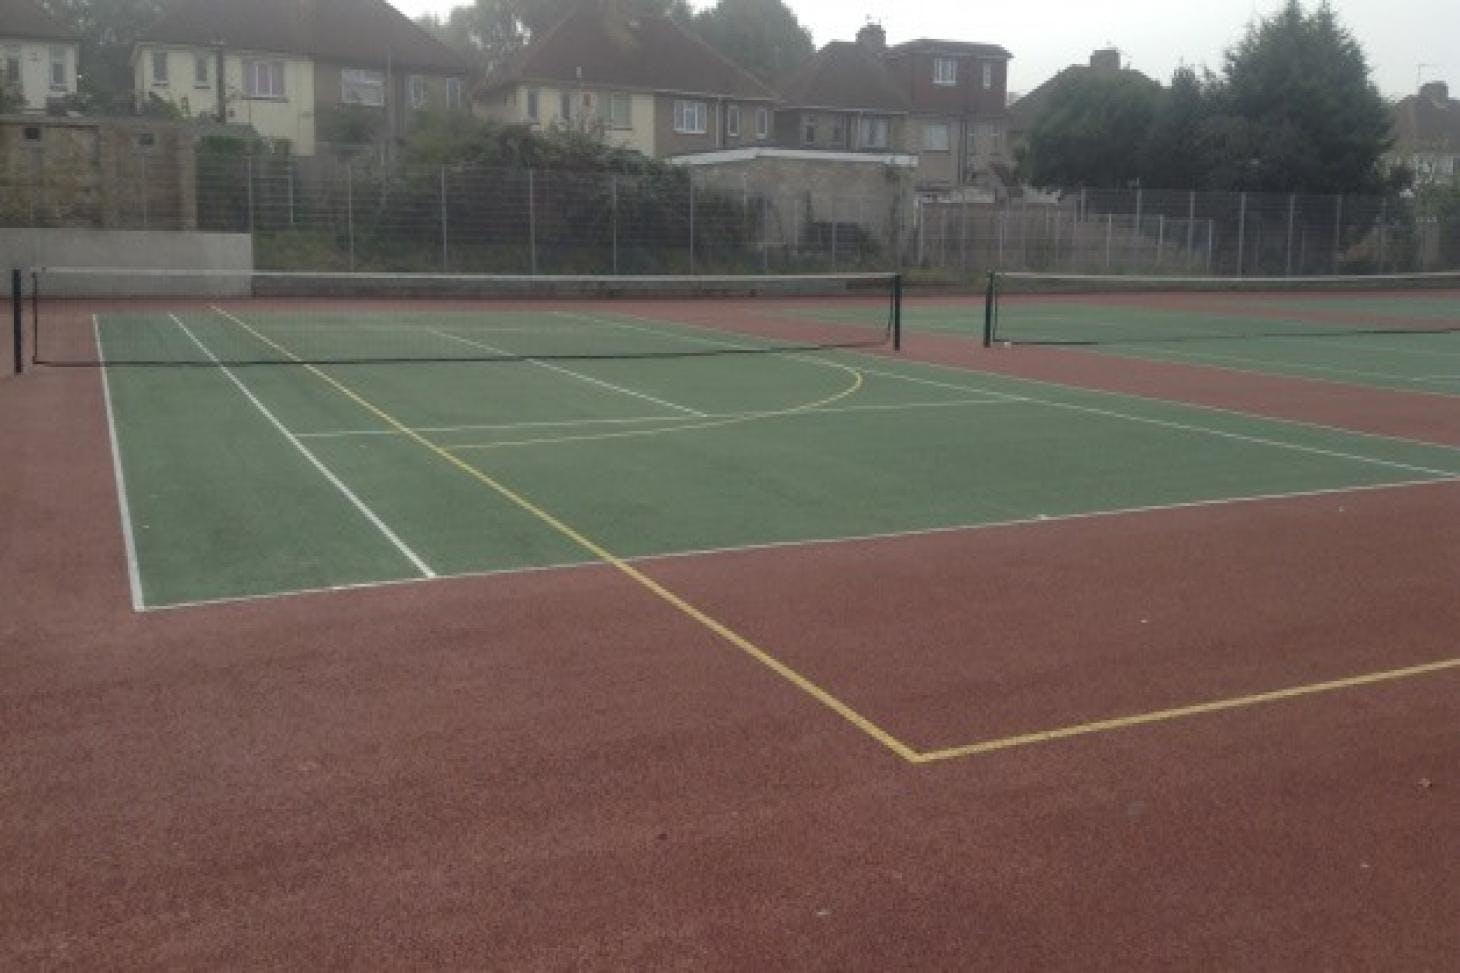 Northfleet Technology College Outdoor   Hard (macadam) tennis court